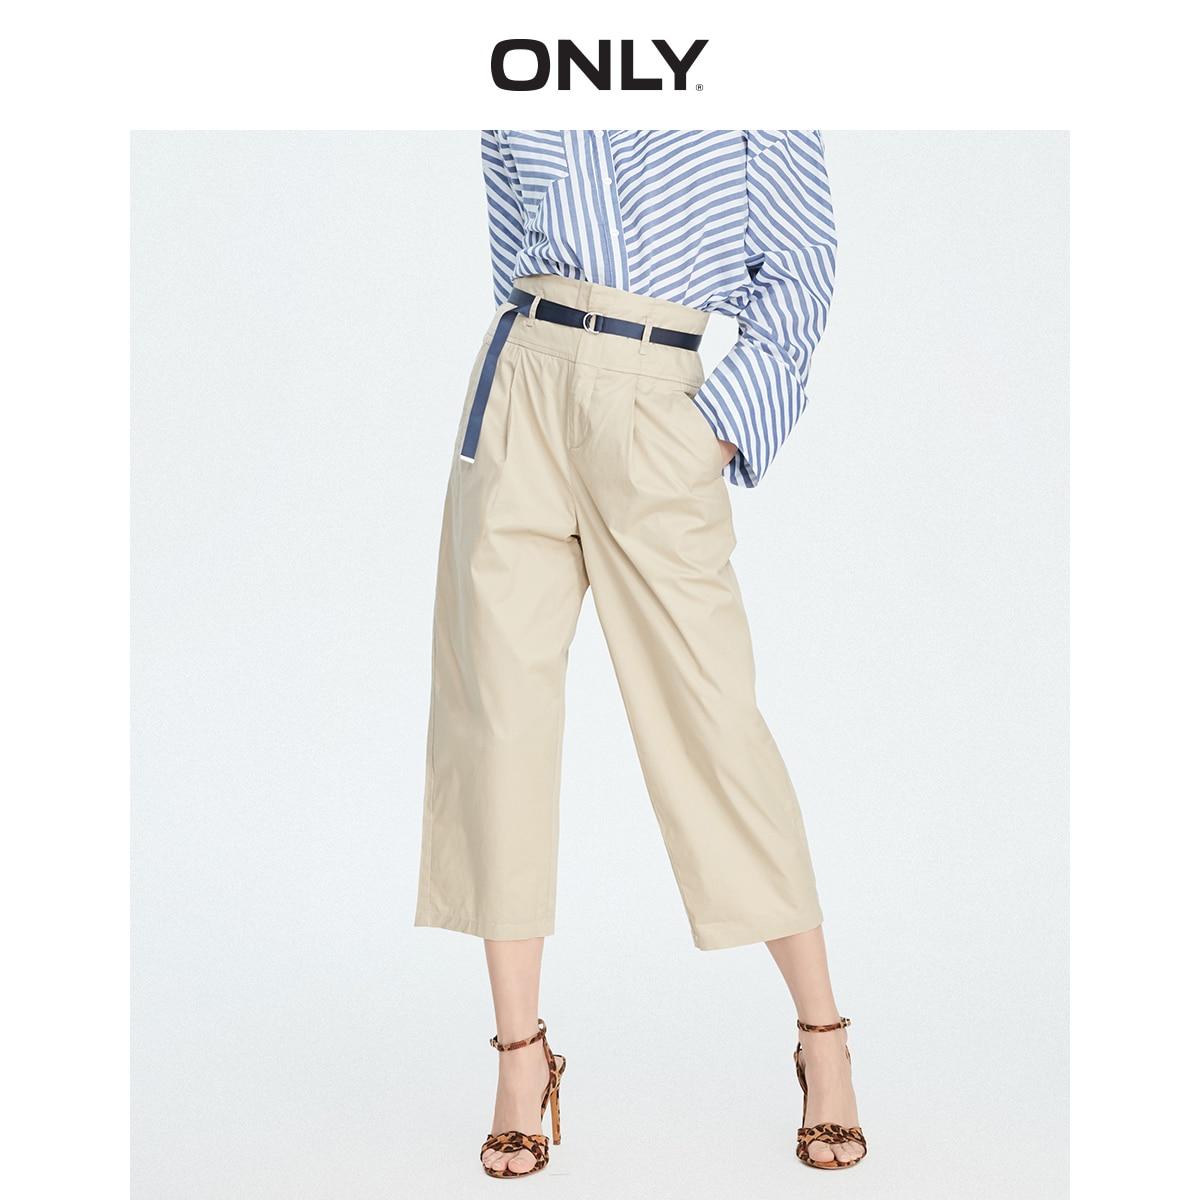 ONLY Women's Loose Fit High-rise Wide-leg Capri Pants | 11916J532